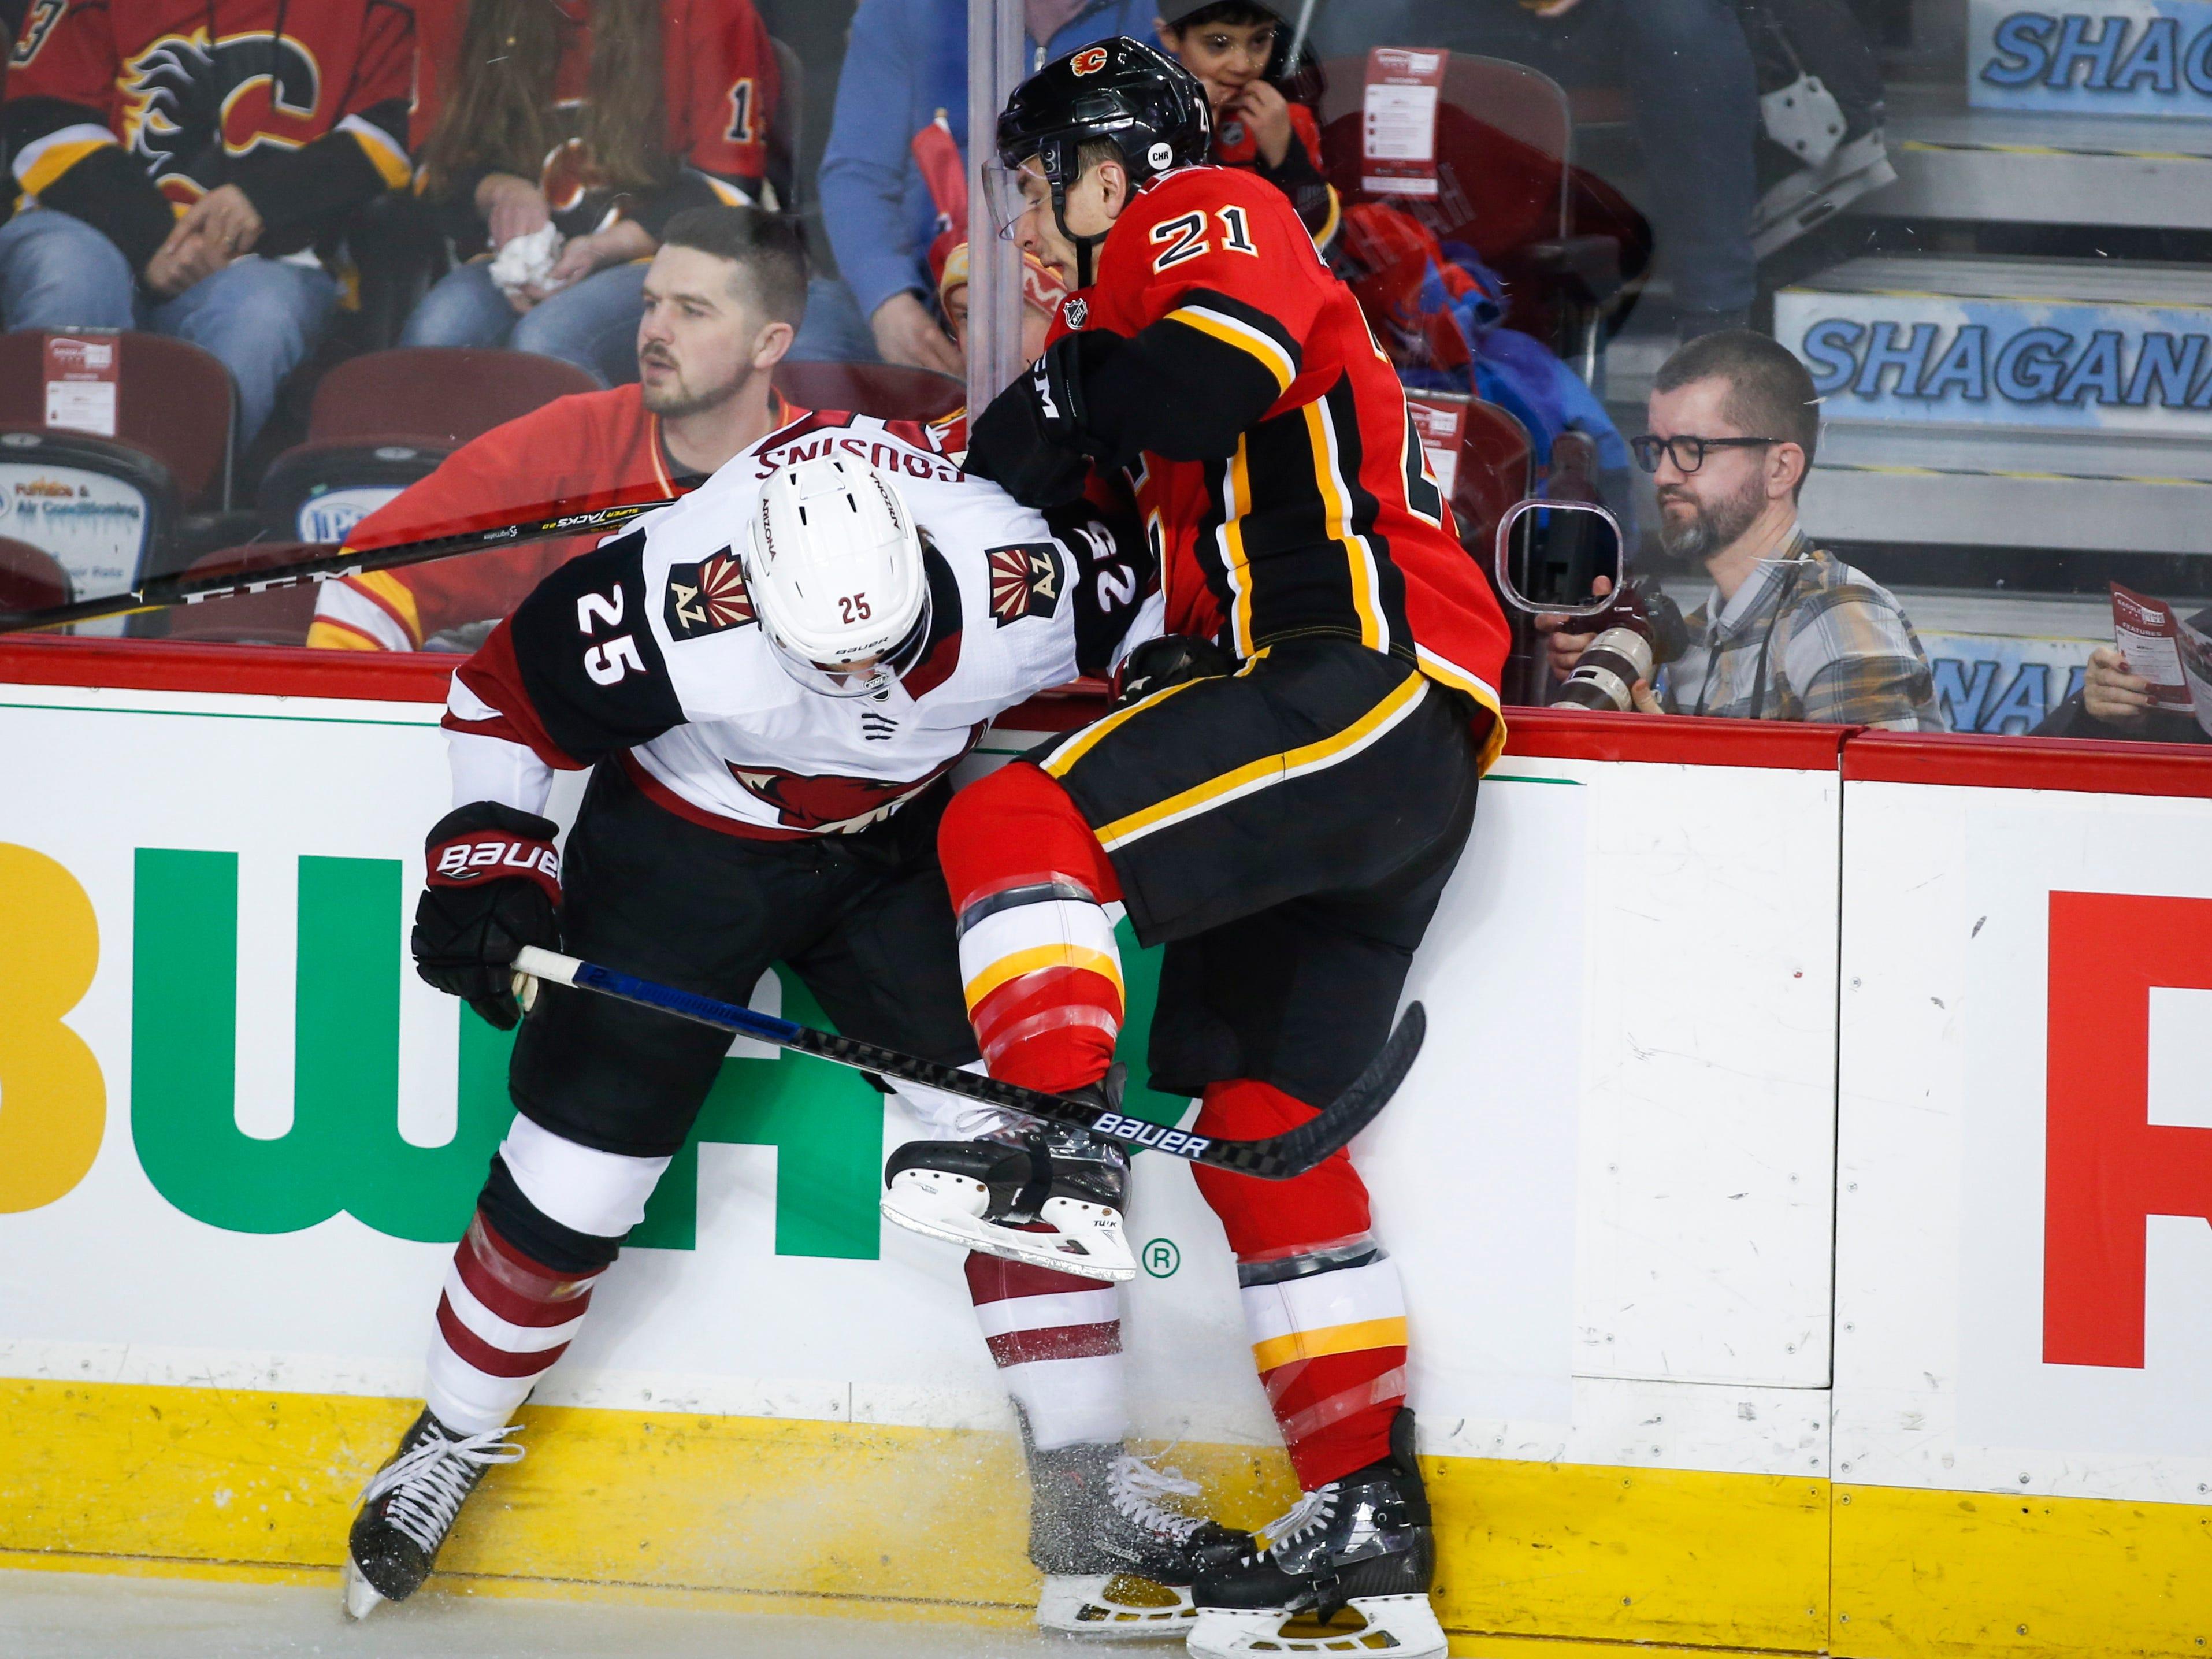 Arizona Coyotes' Nick Cousins, left, checks Calgary Flames' Garnet Hathaway during first period NHL hockey action in Calgary, Alberta, Monday, Feb. 18, 2019.